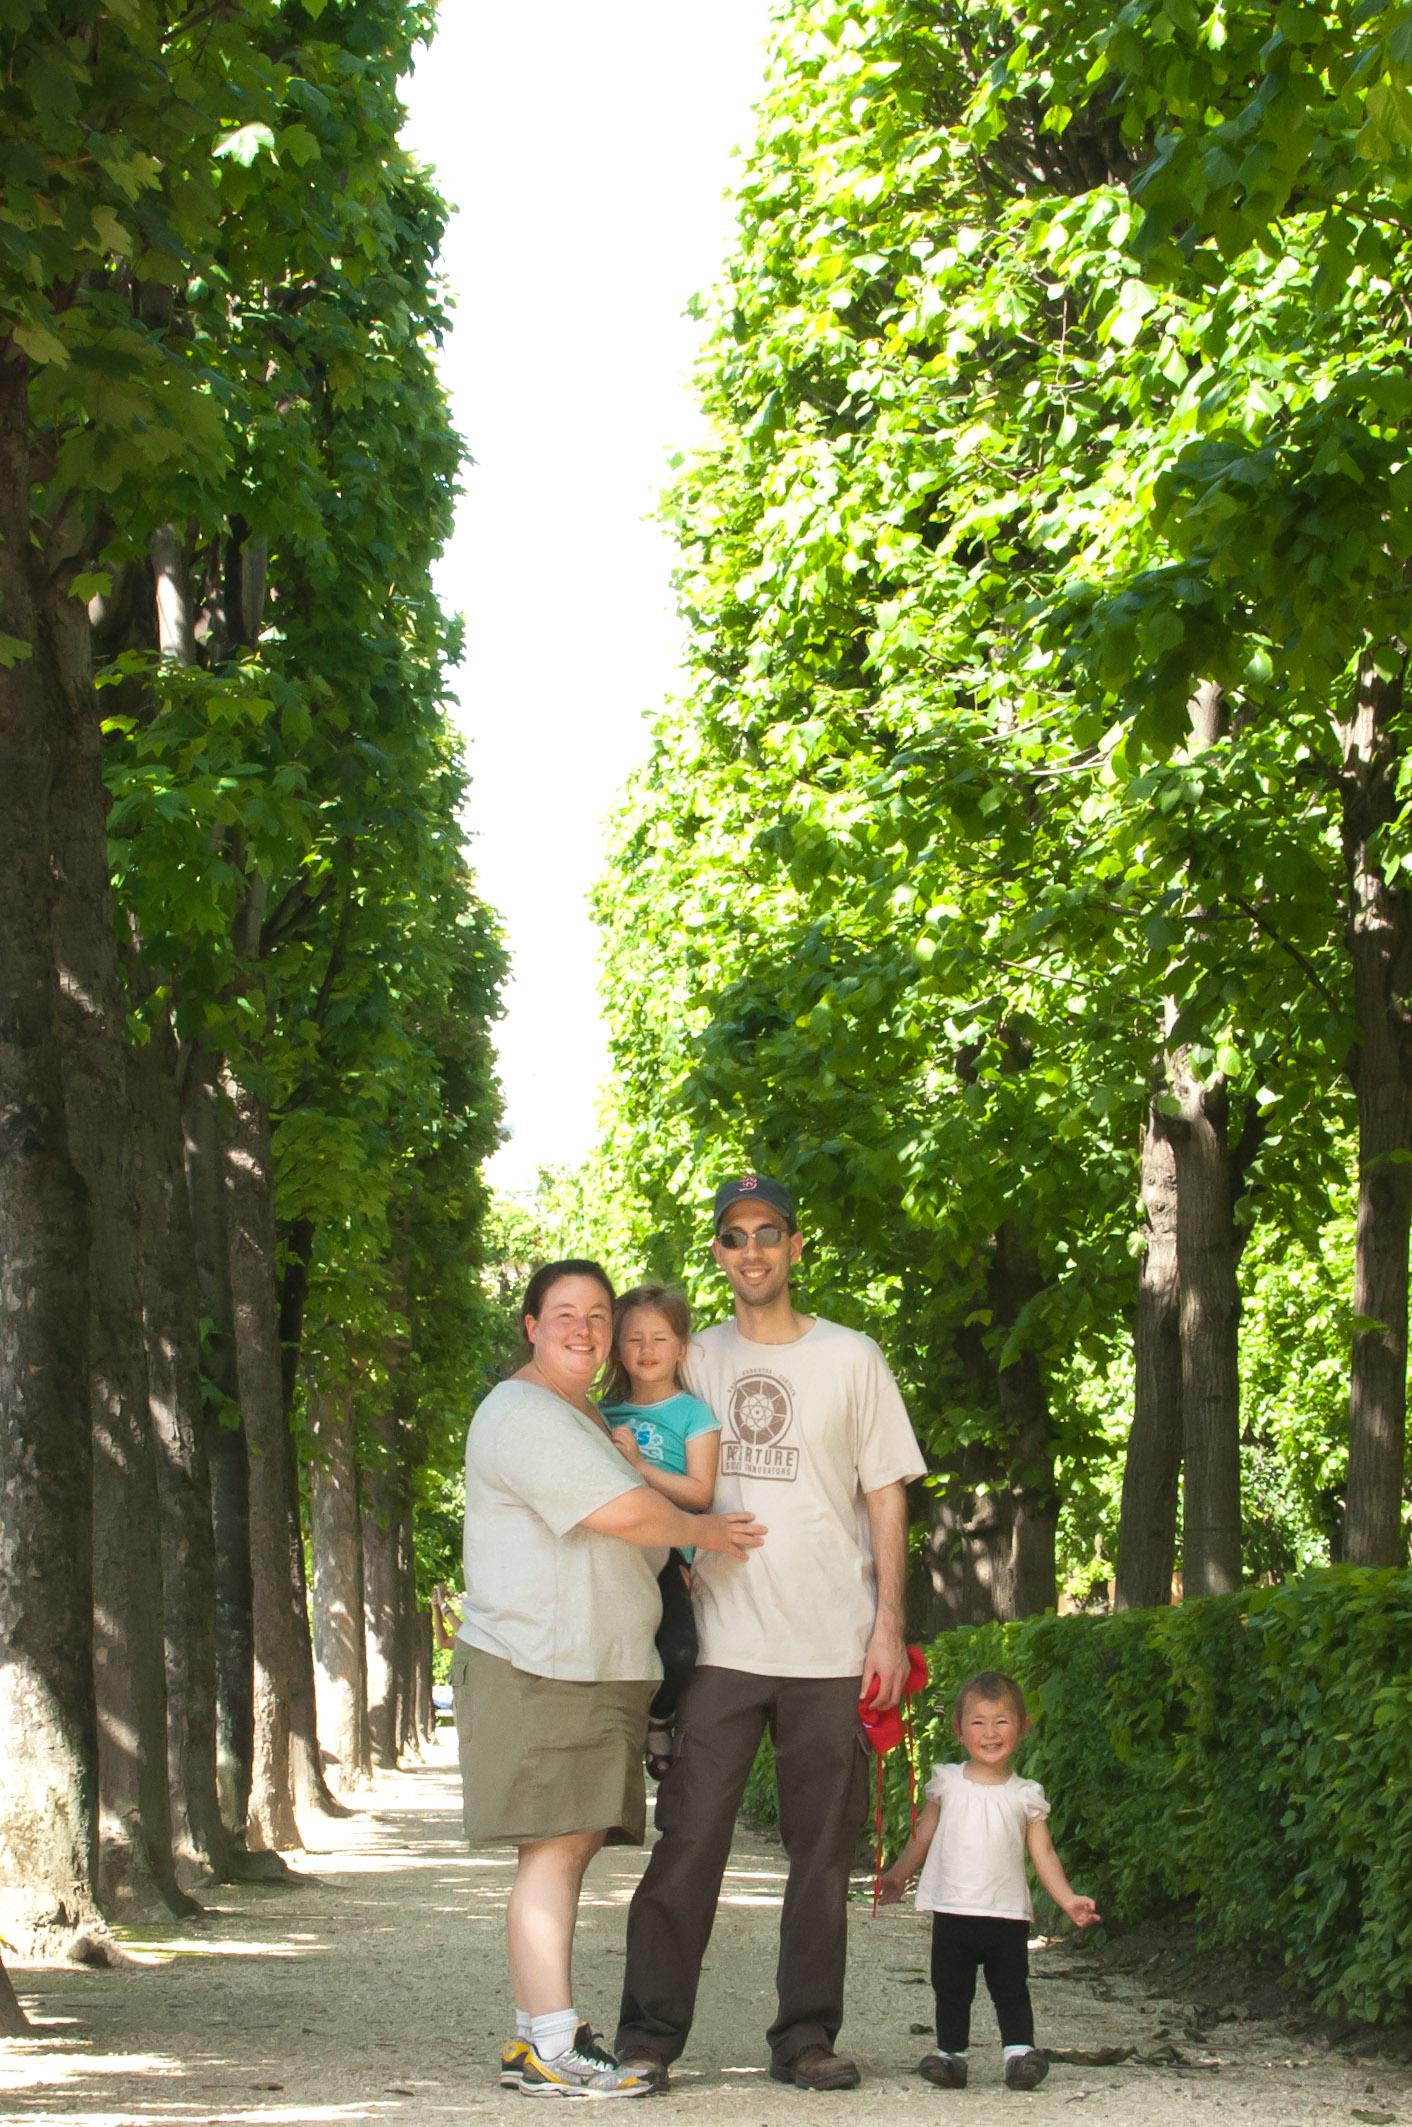 Jen, Josie, Jordi and Celia at the Rodin Gardens